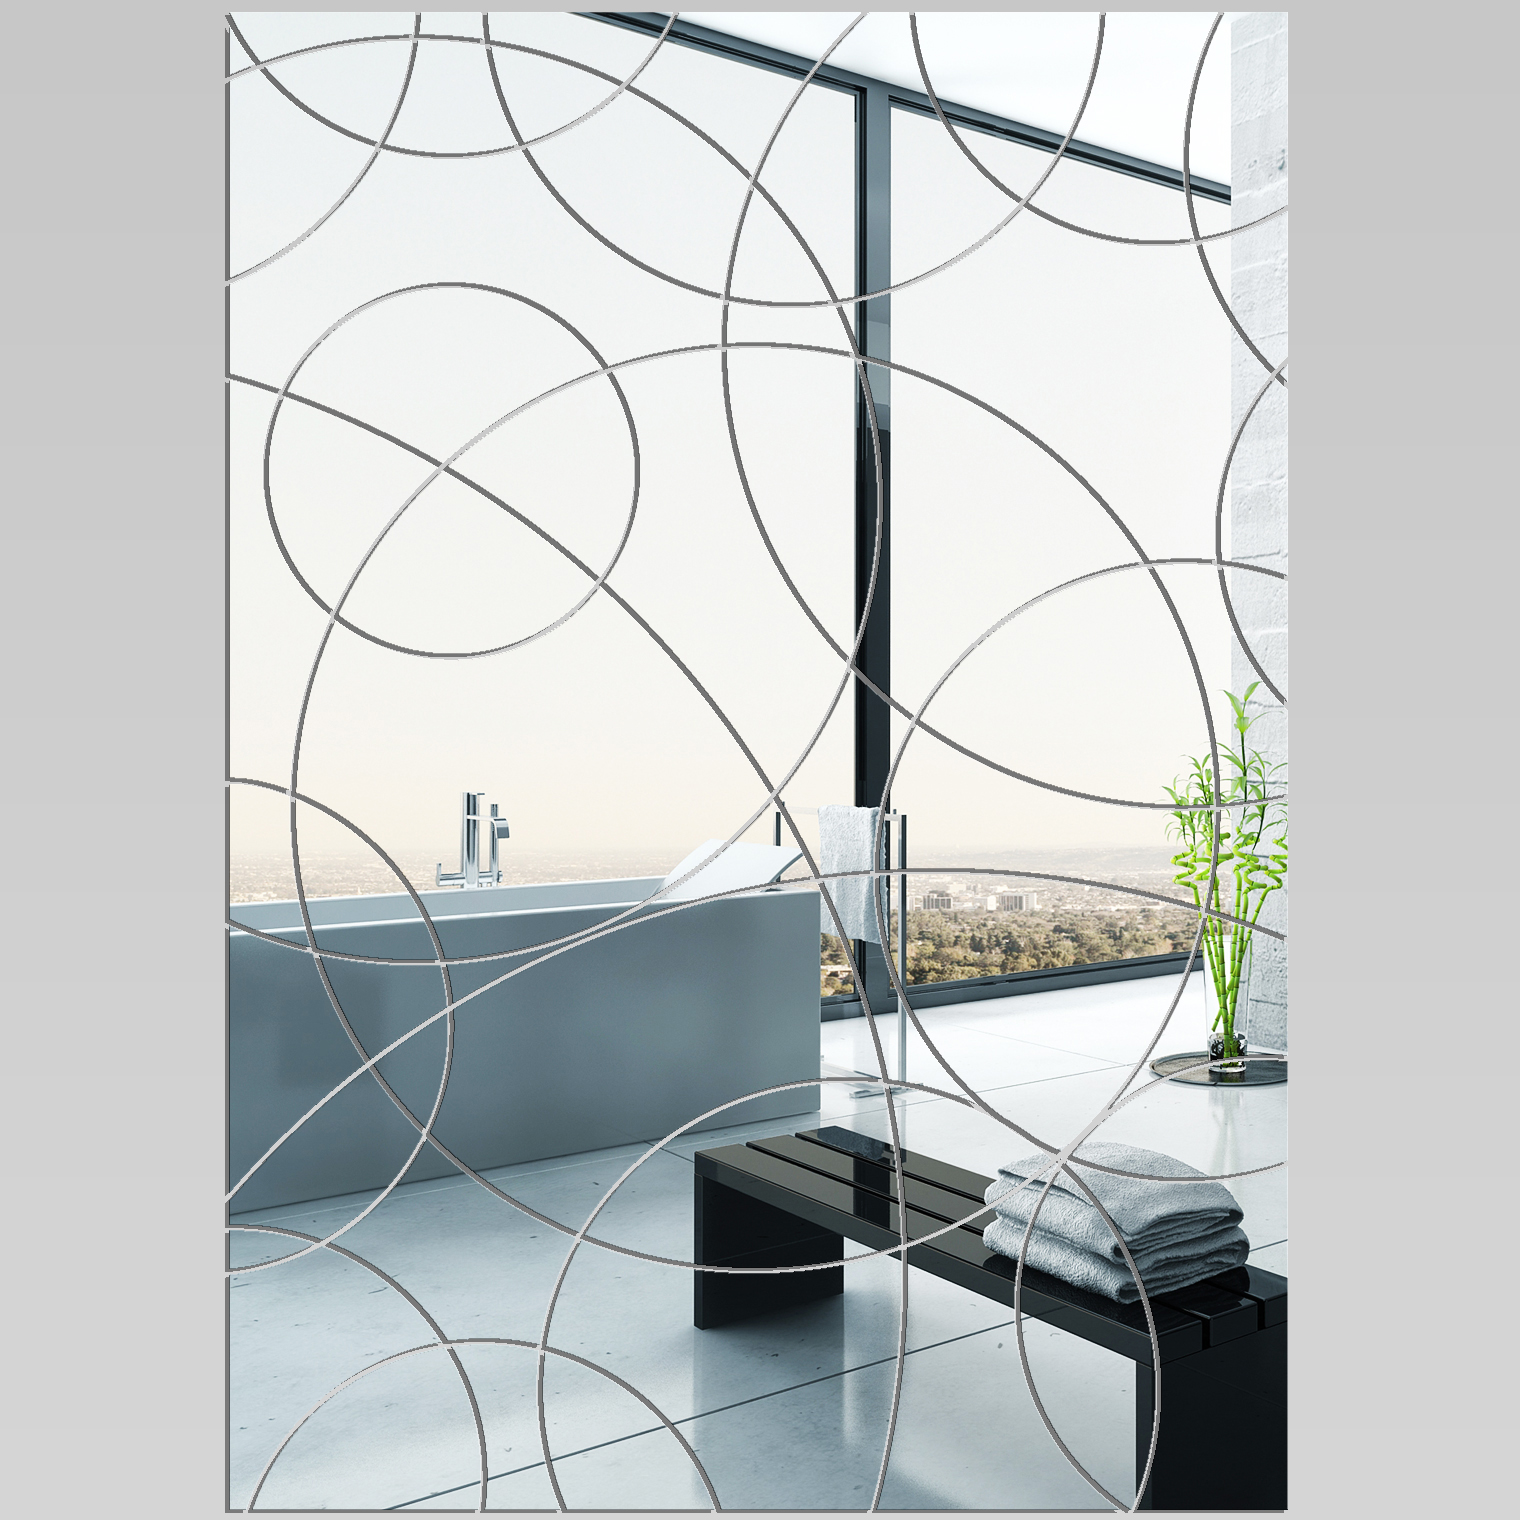 Miroir plexiglass acrylique rectangle design pas cher for Miroir en acrylique